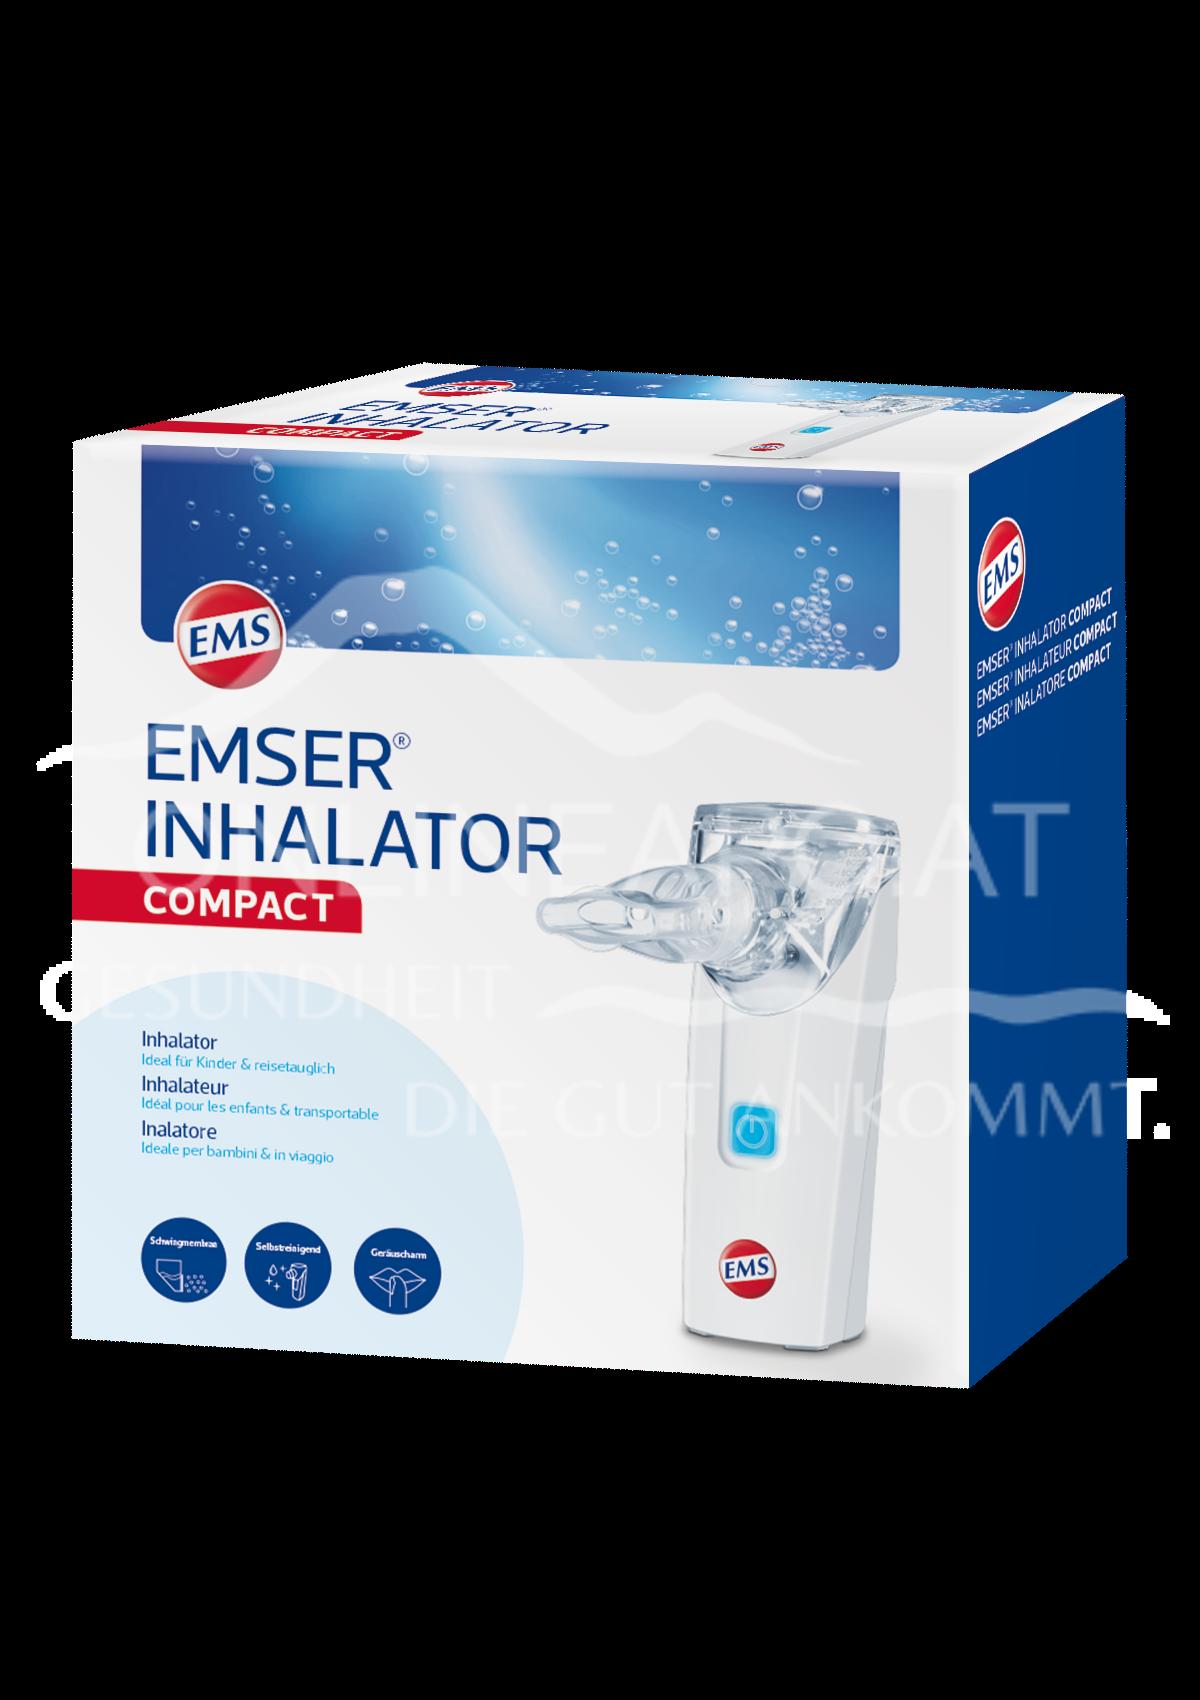 Emser® Inhalator compact